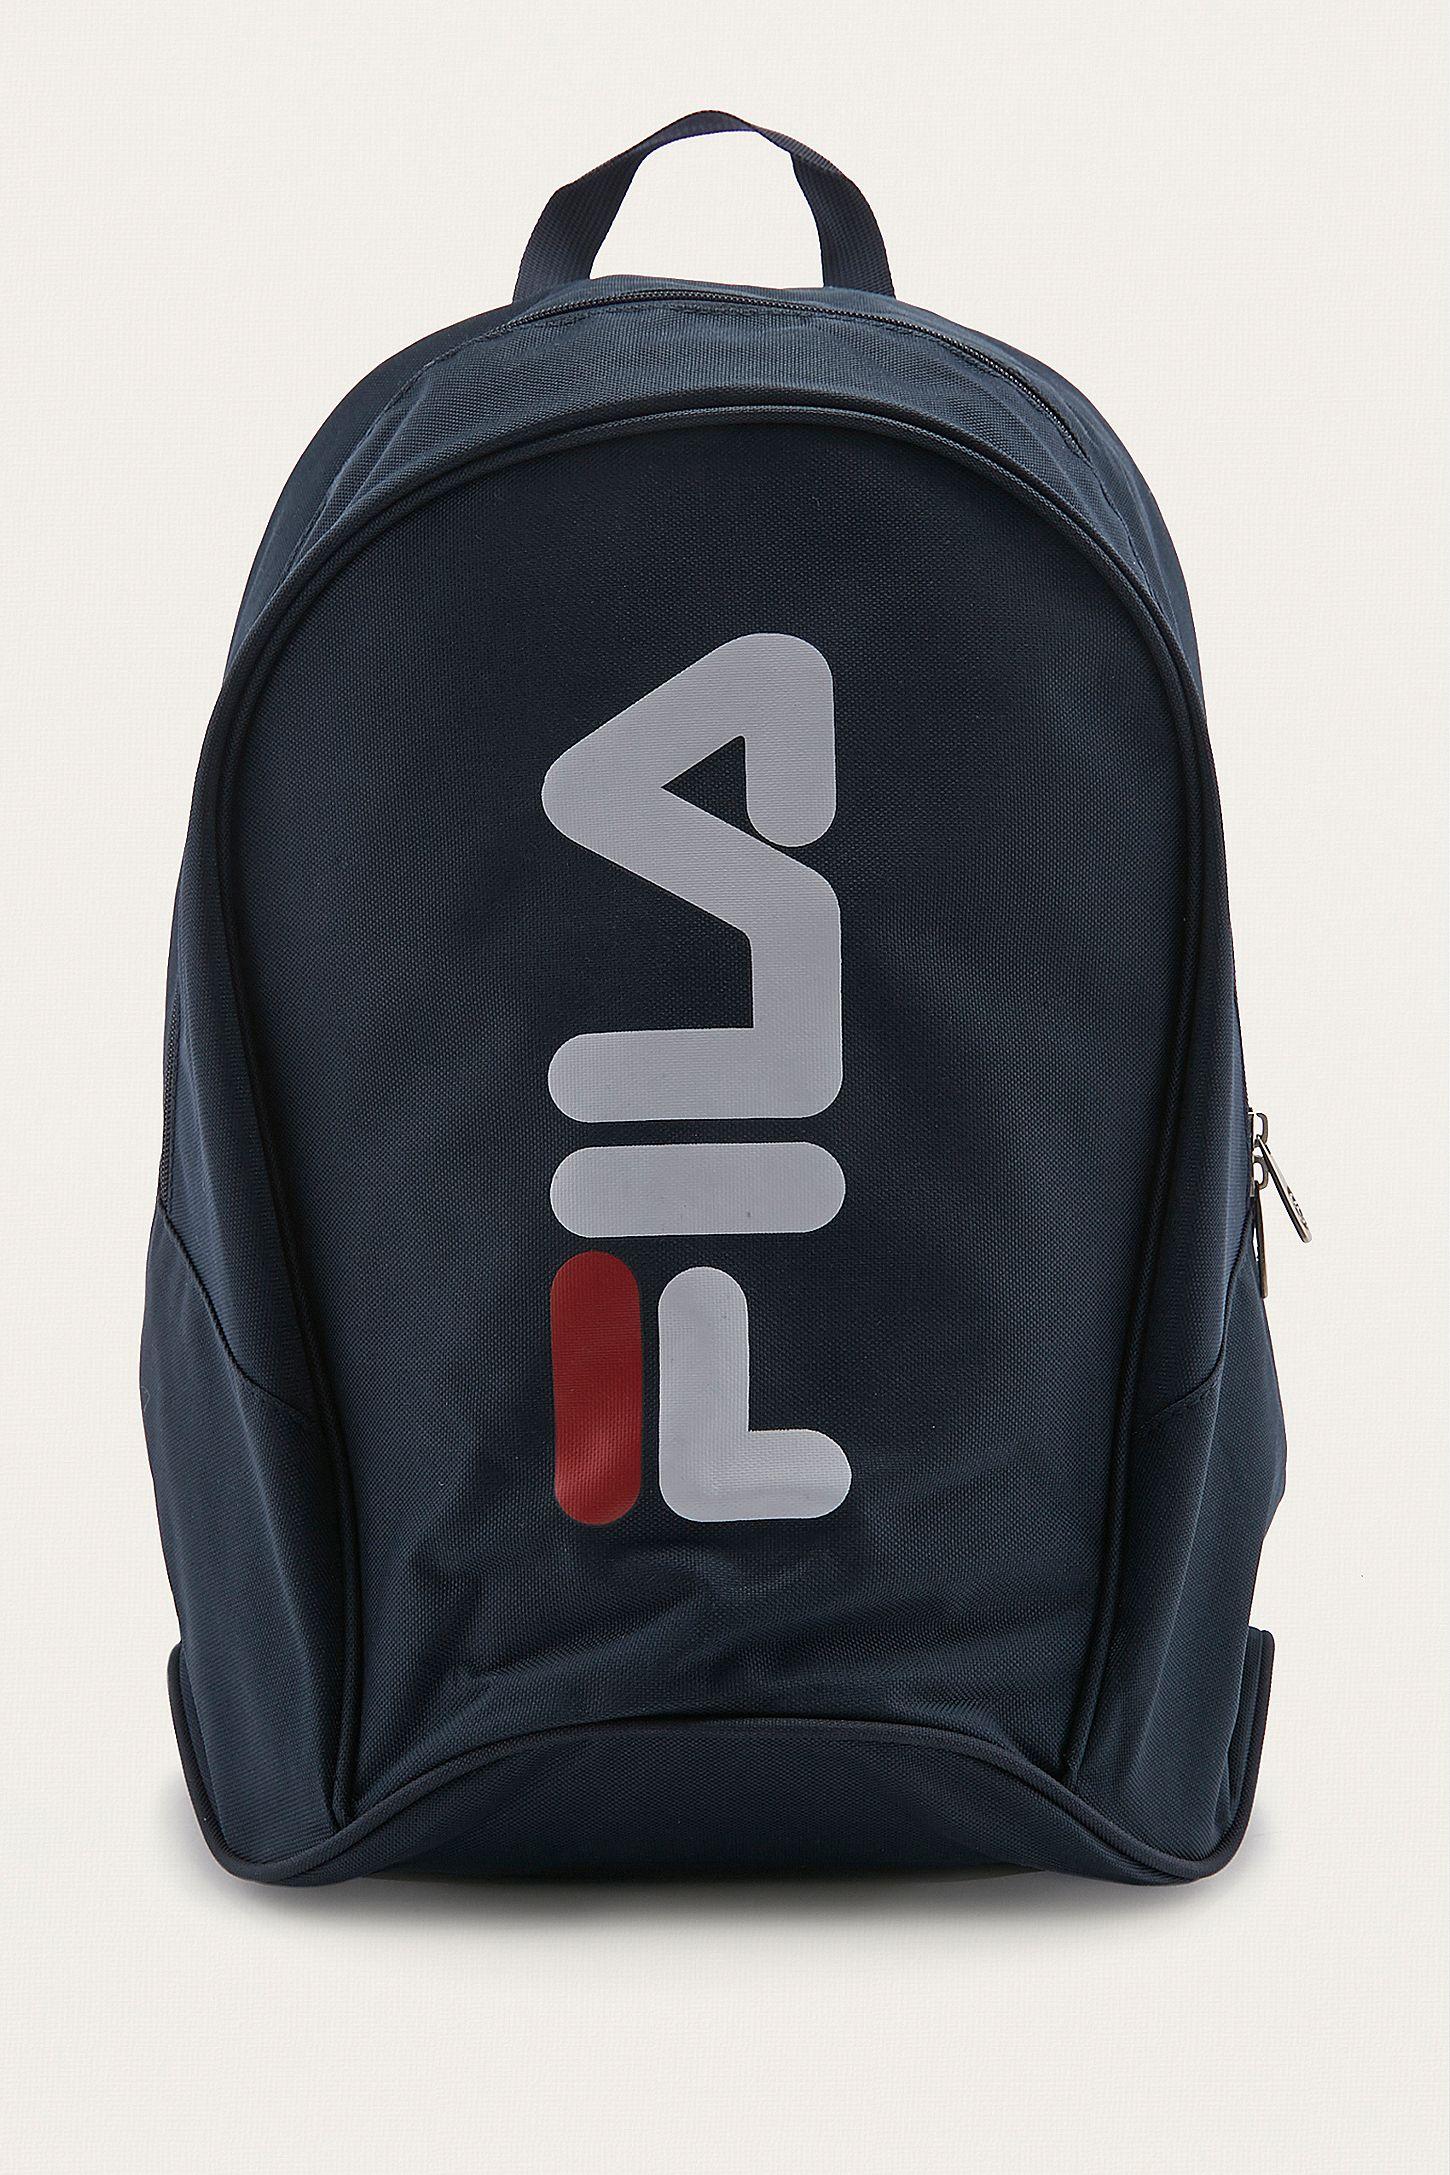 FILA Bradley Navy Backpack